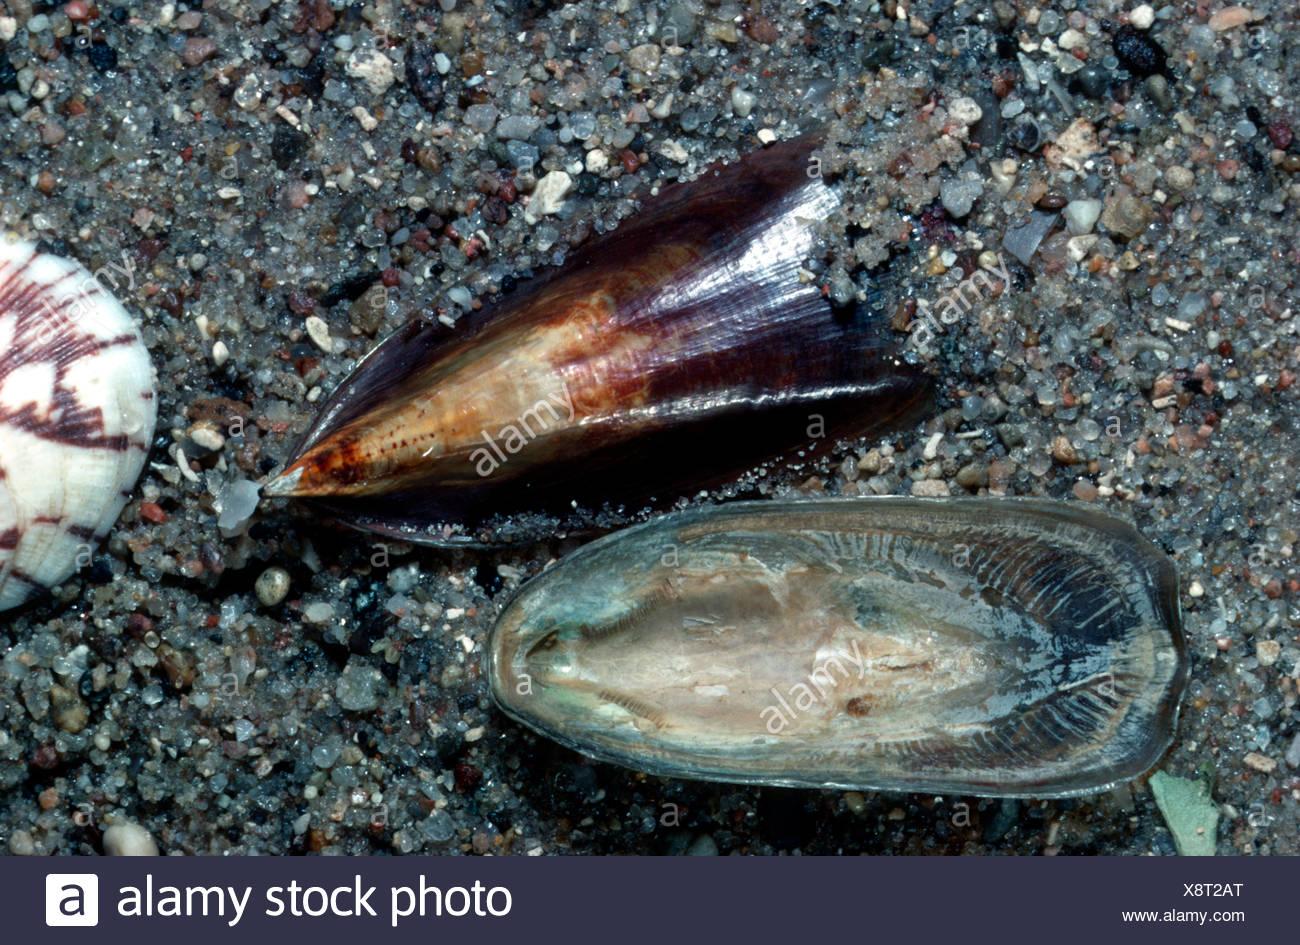 lingulid (Lingula hians), shells on wet sand, Philippines - Stock Image